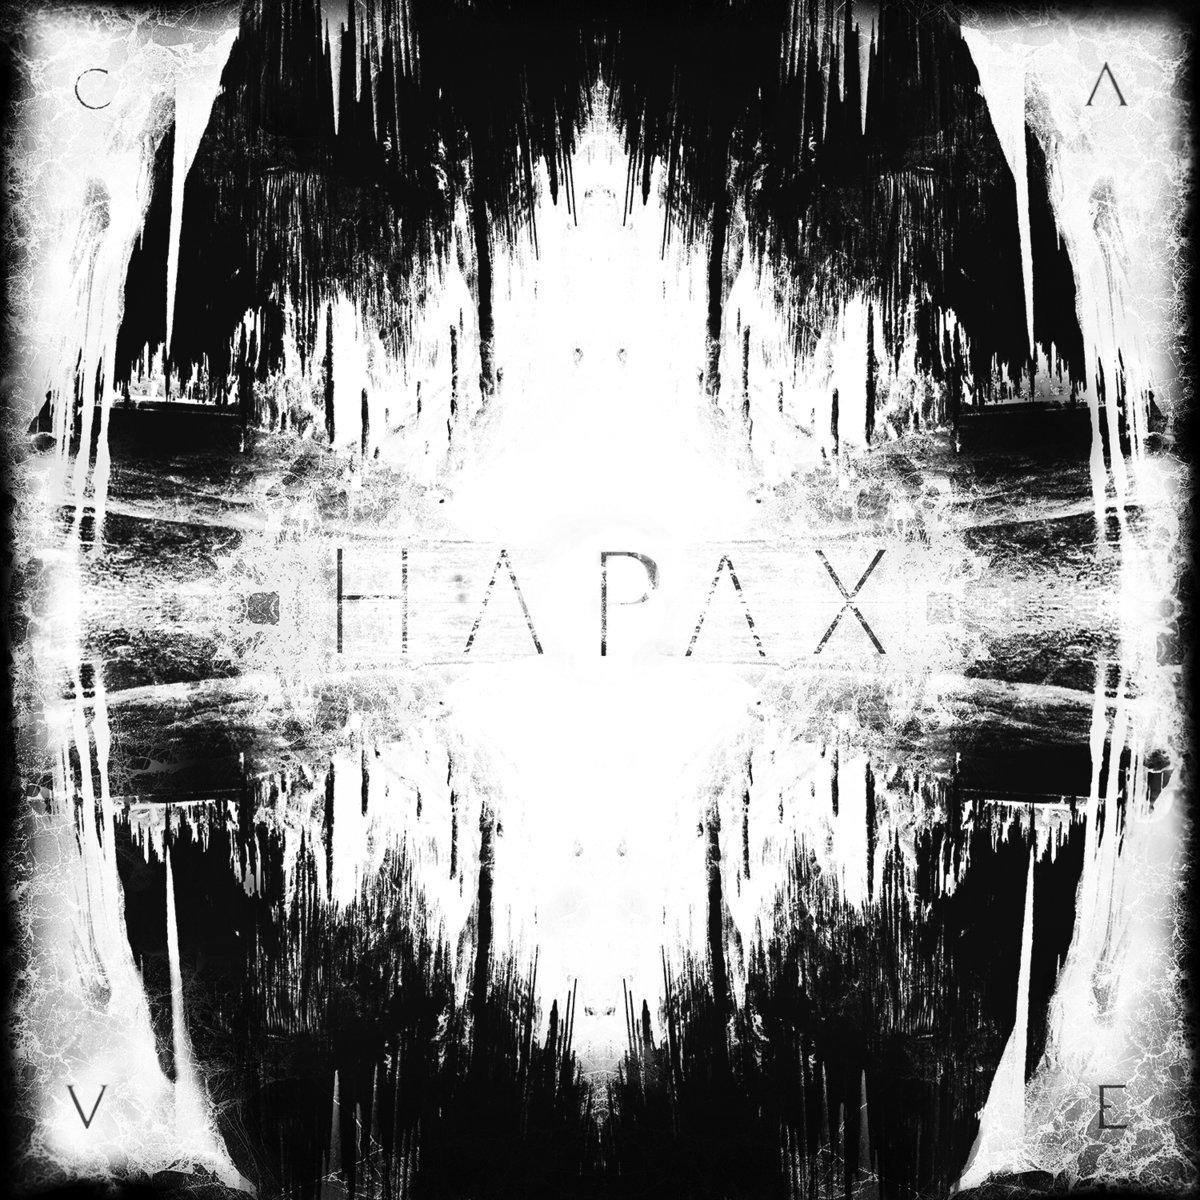 Hapax, Cave